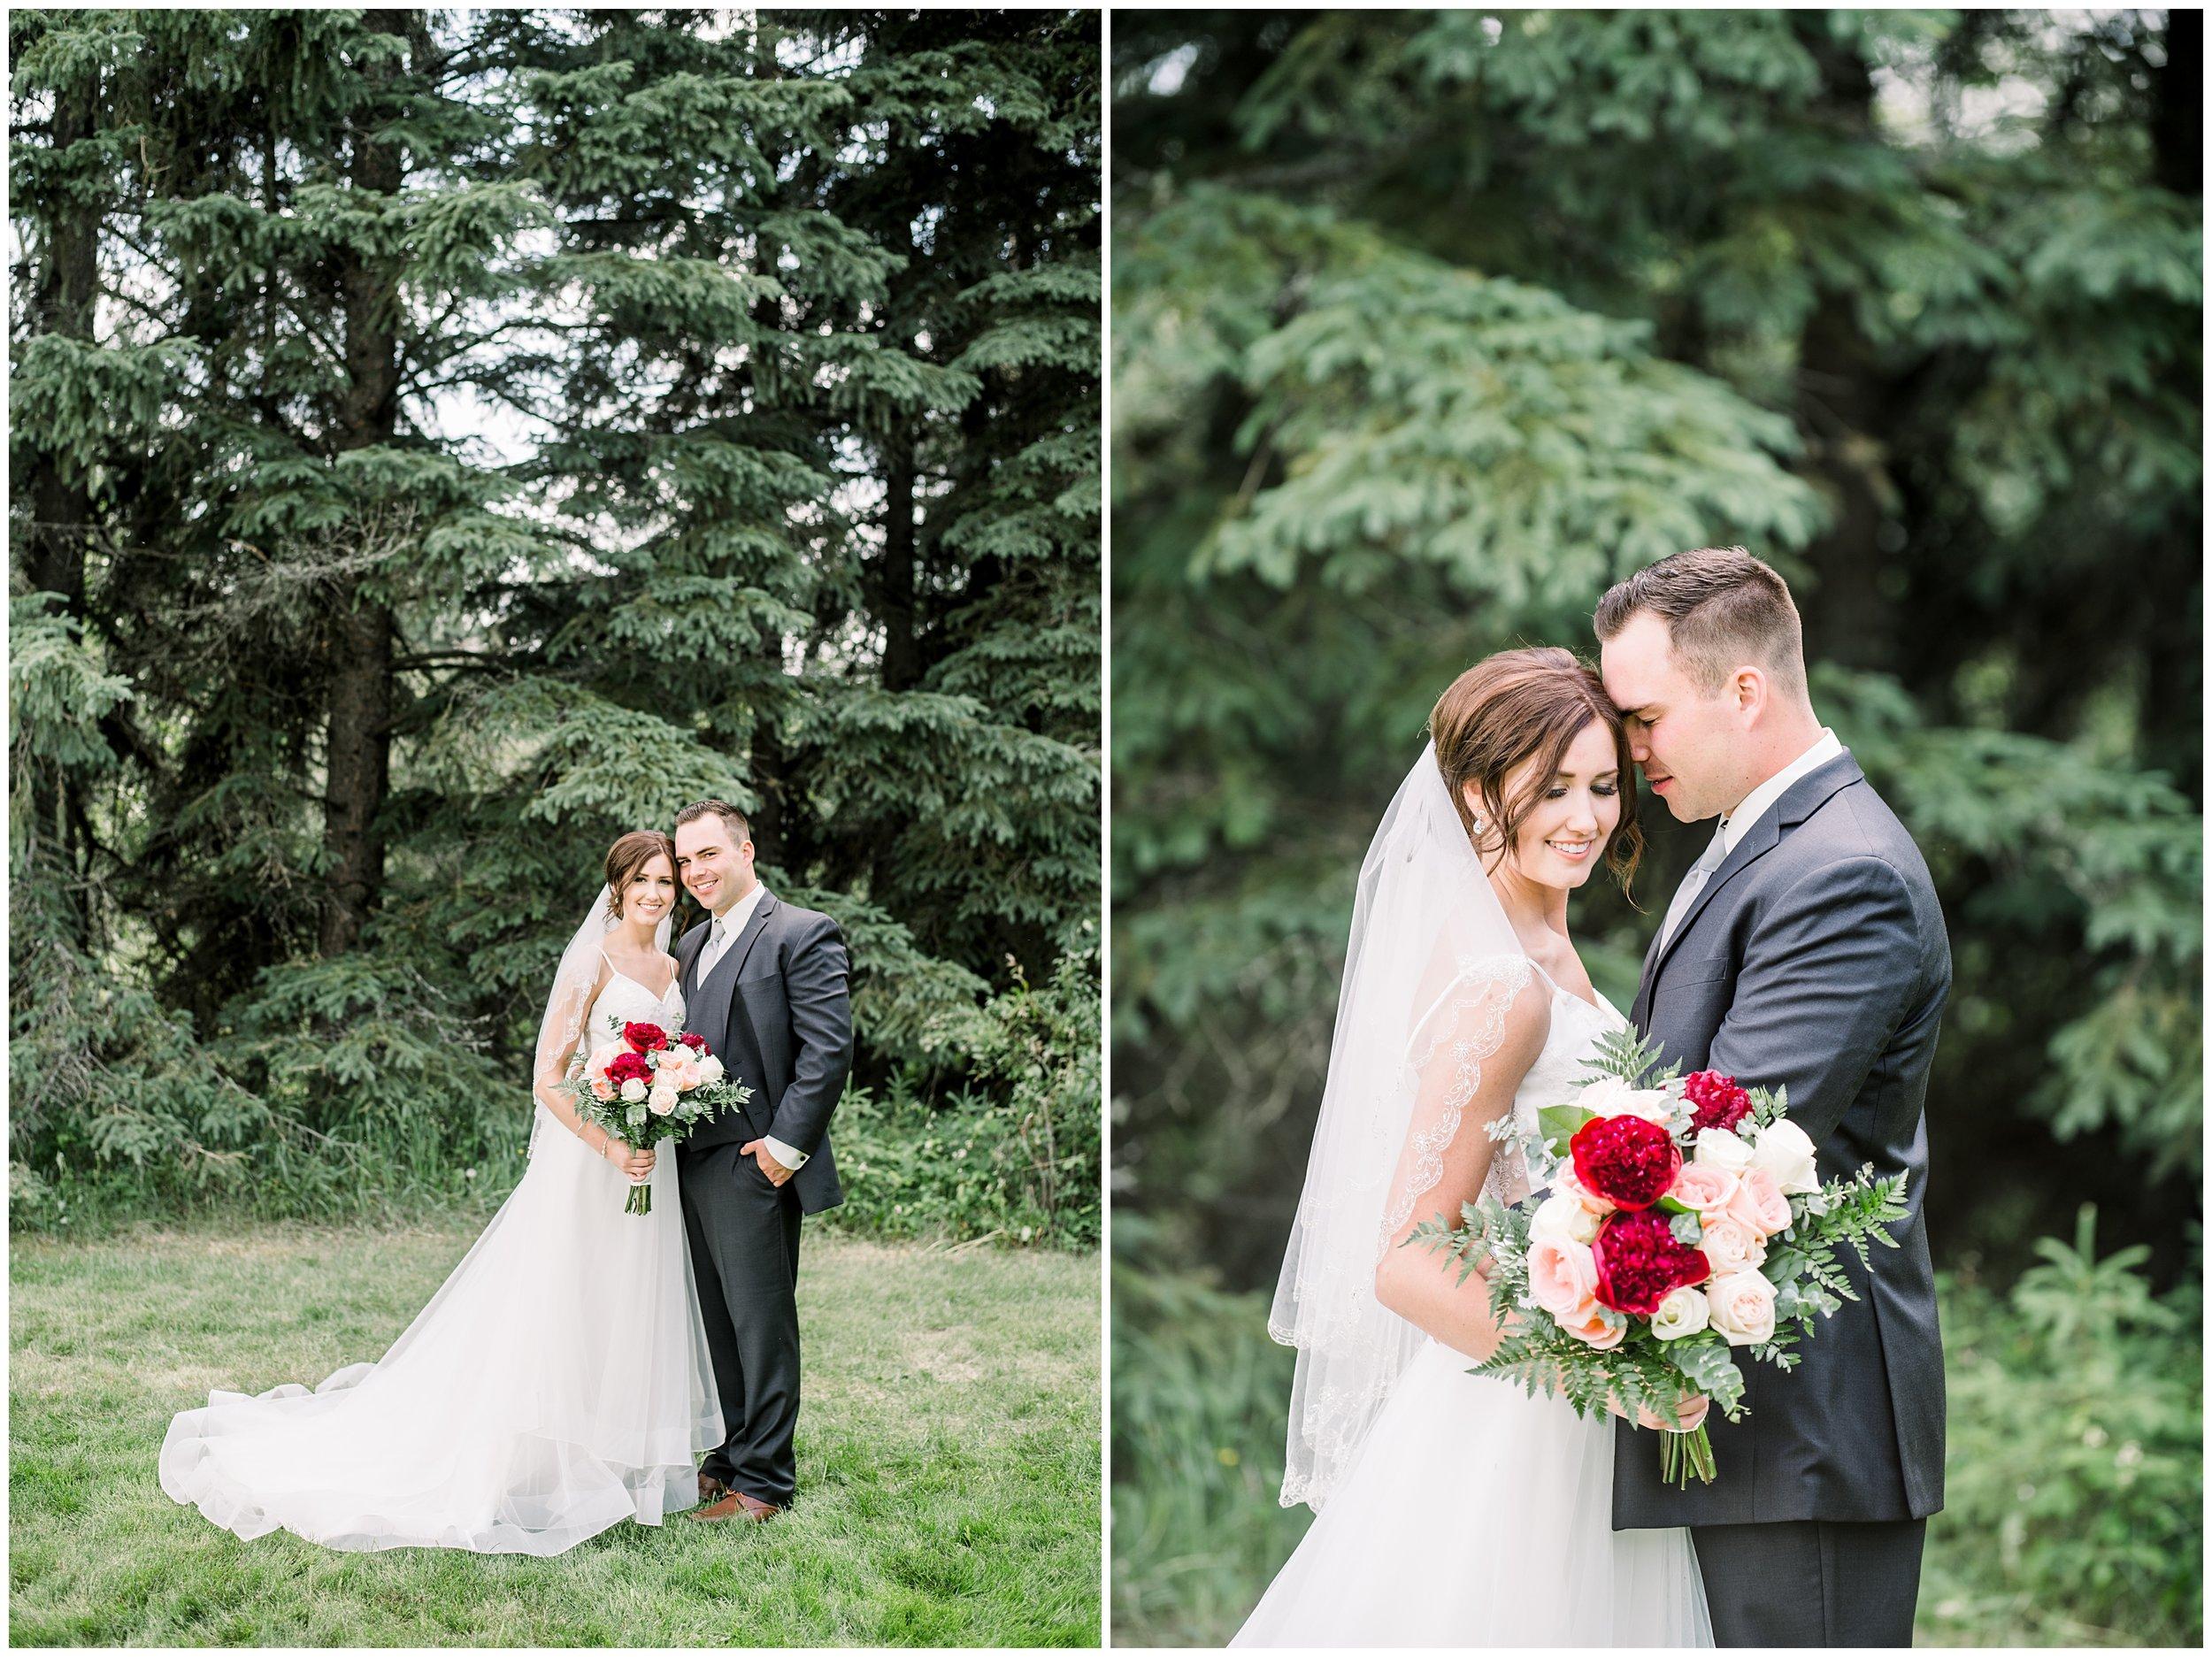 Alyssa-Poland-Photography_0618_alberta wedding.jpg